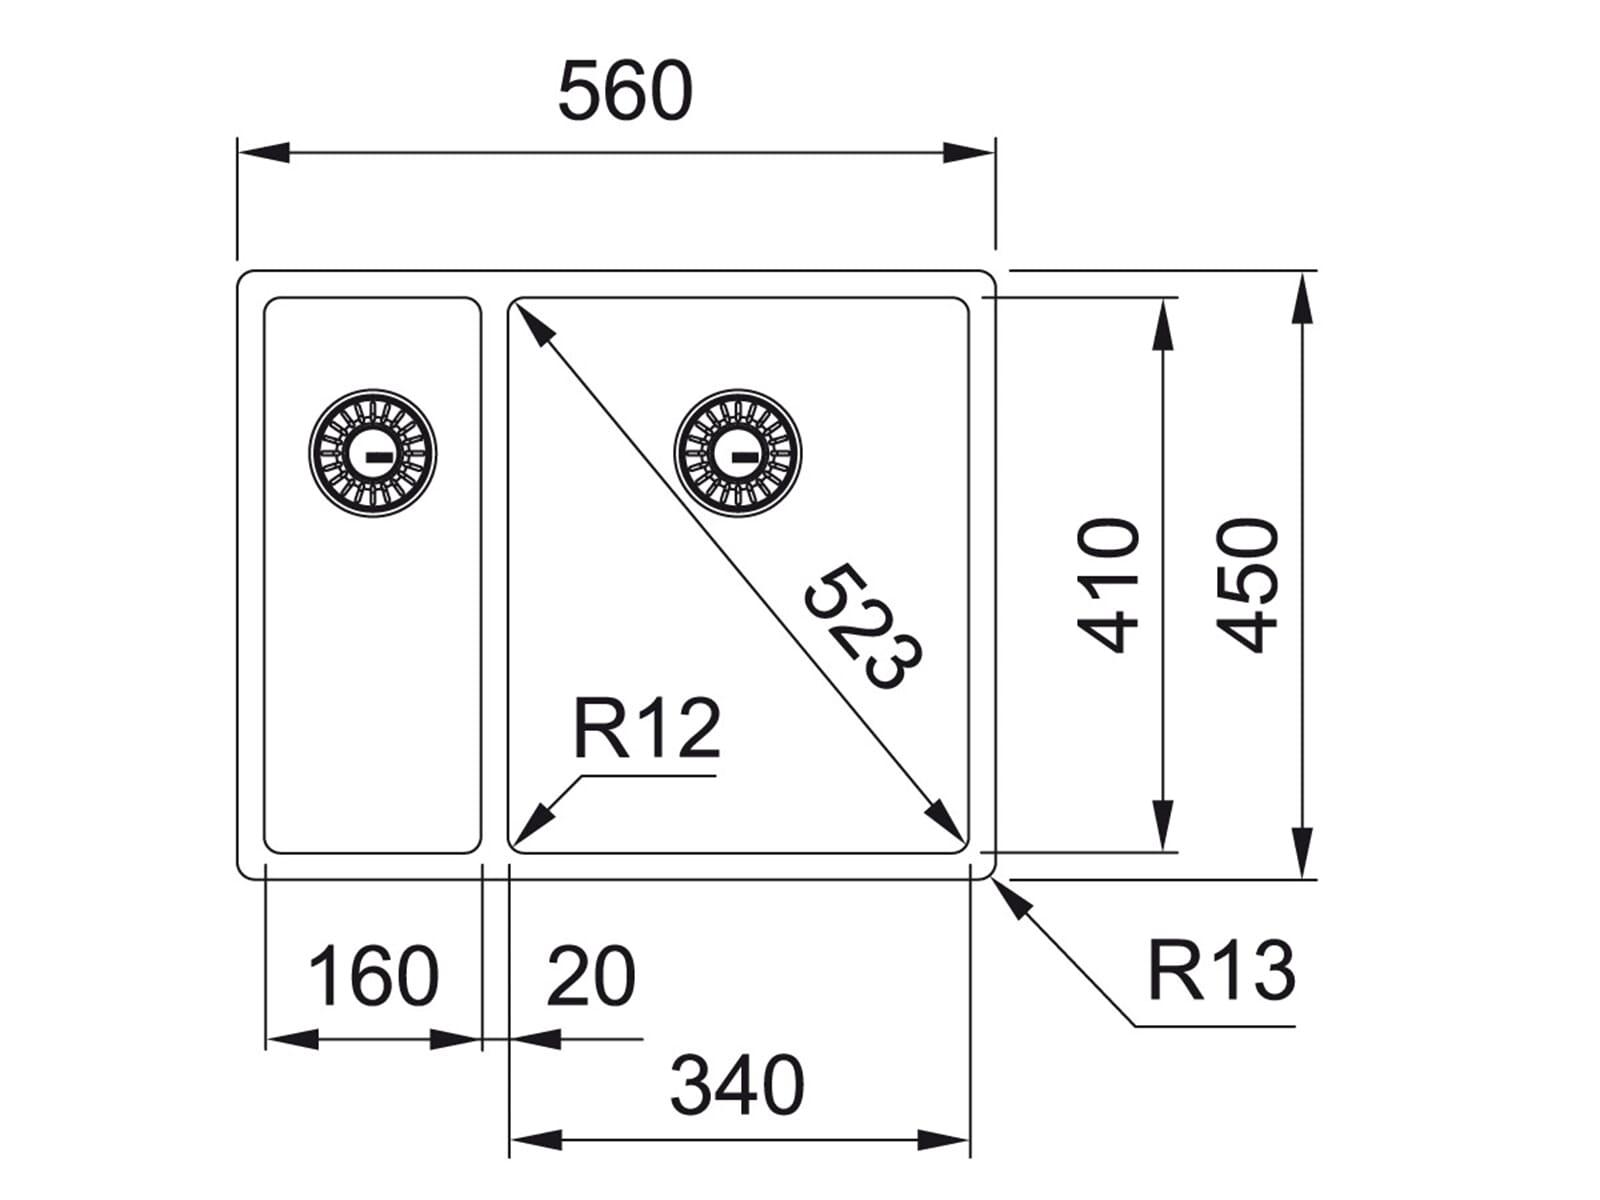 Franke Box BXX 160-34-16 Edelstahlspüle glatt - 122.0375.283 Unterbau